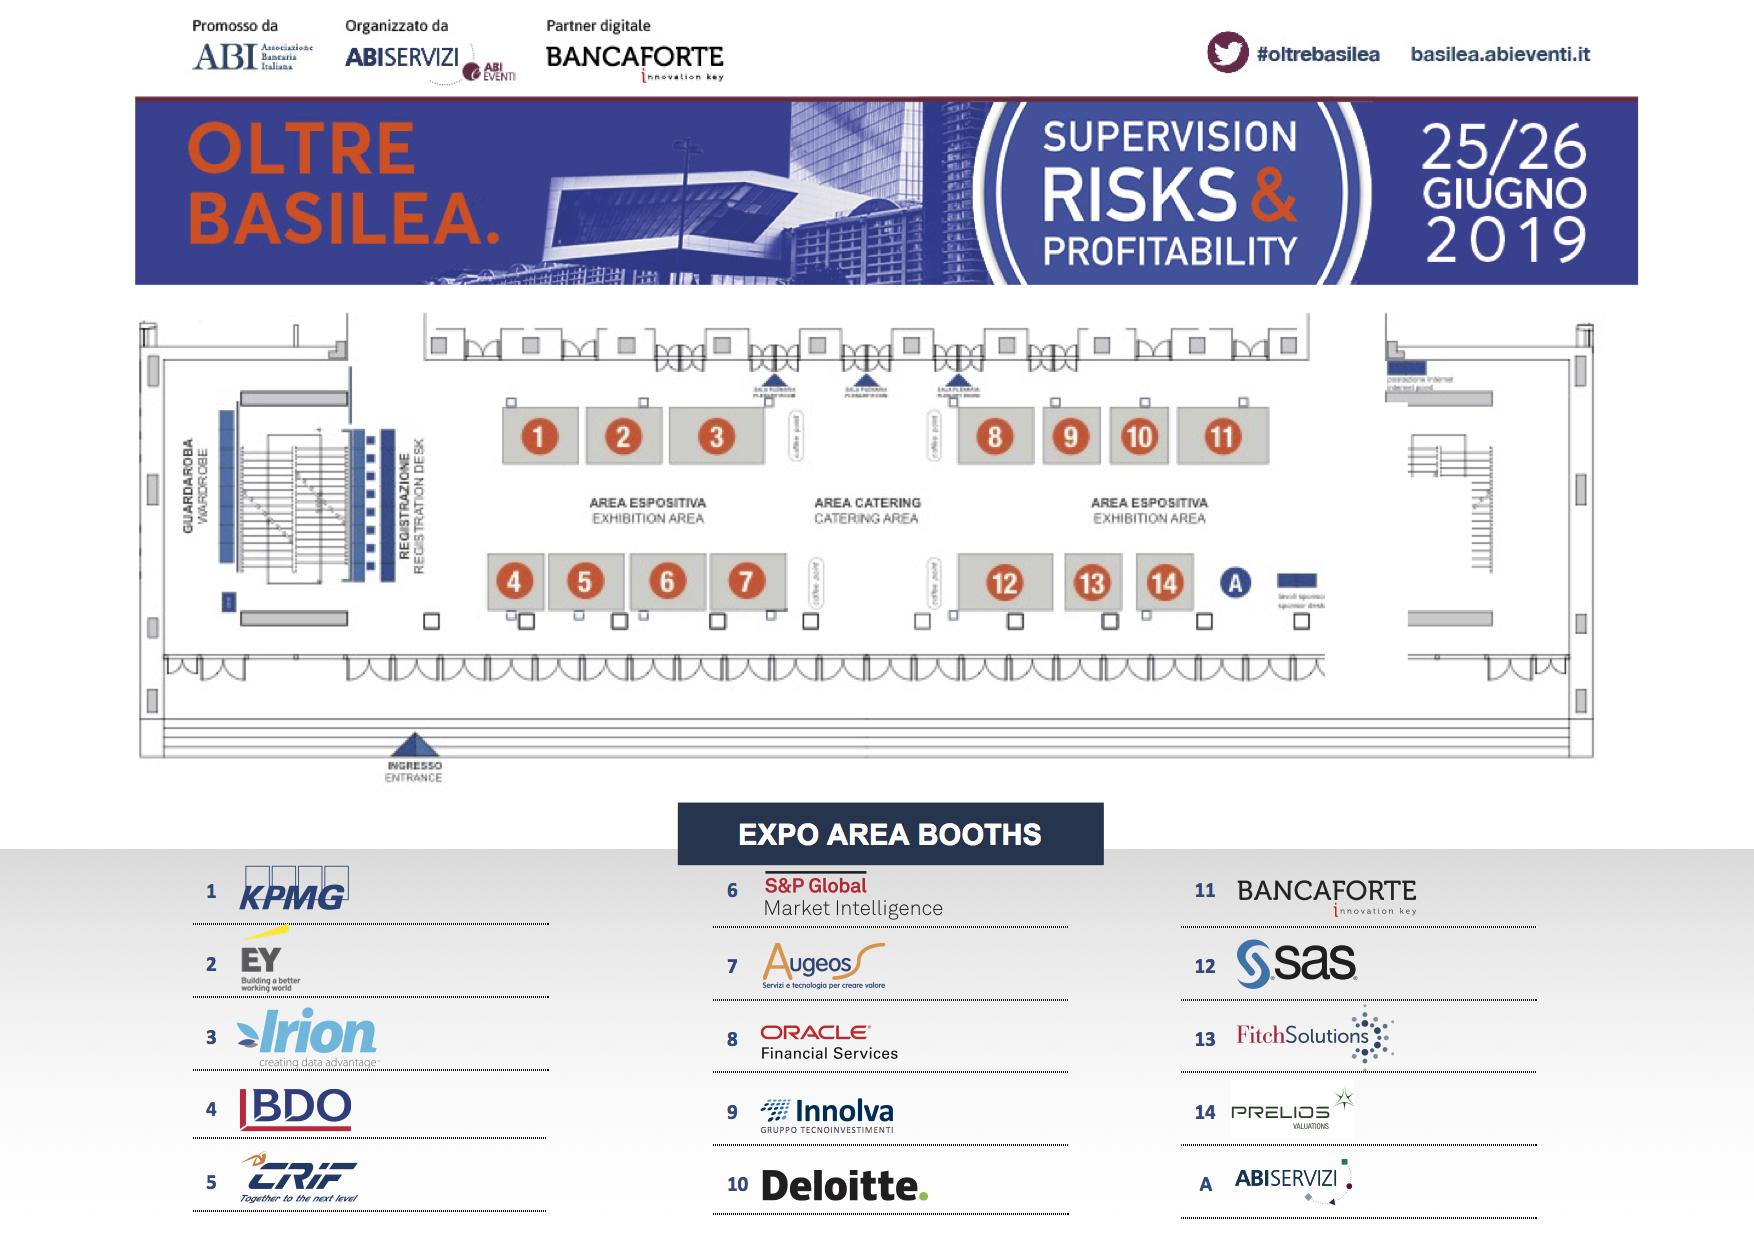 Area Espositiva - Supervision, Risks & Profitability 2019